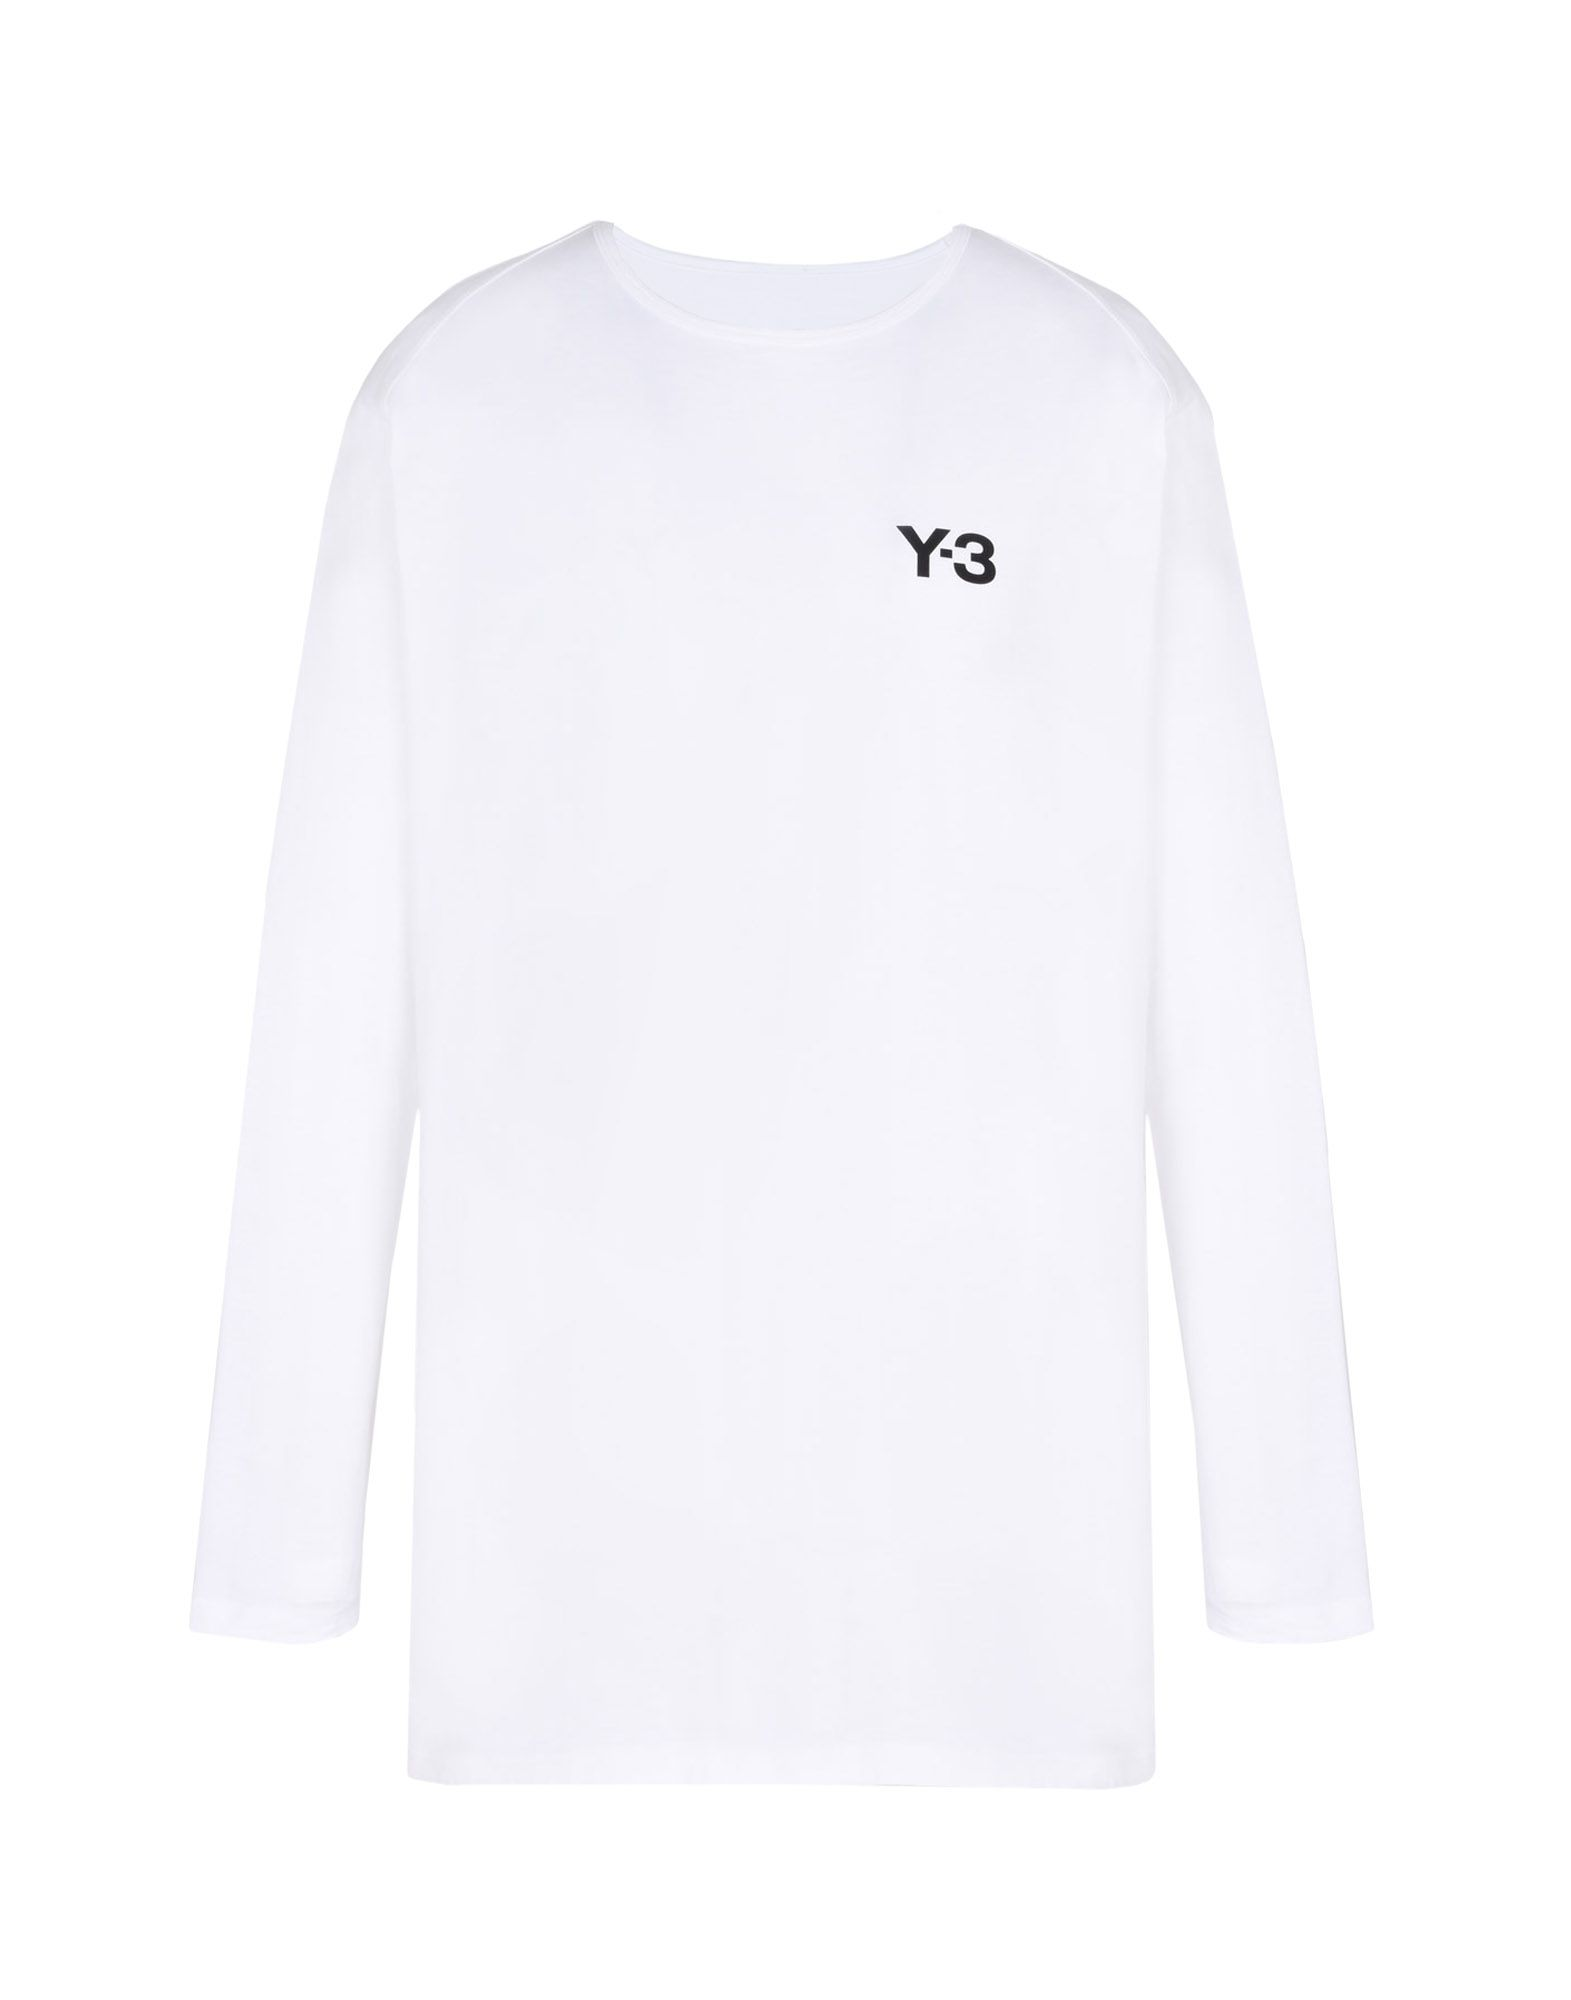 71a7b61615f1e ... Y-3 Y-3 LOGO LS TEE Long sleeve t-shirt Man f ...